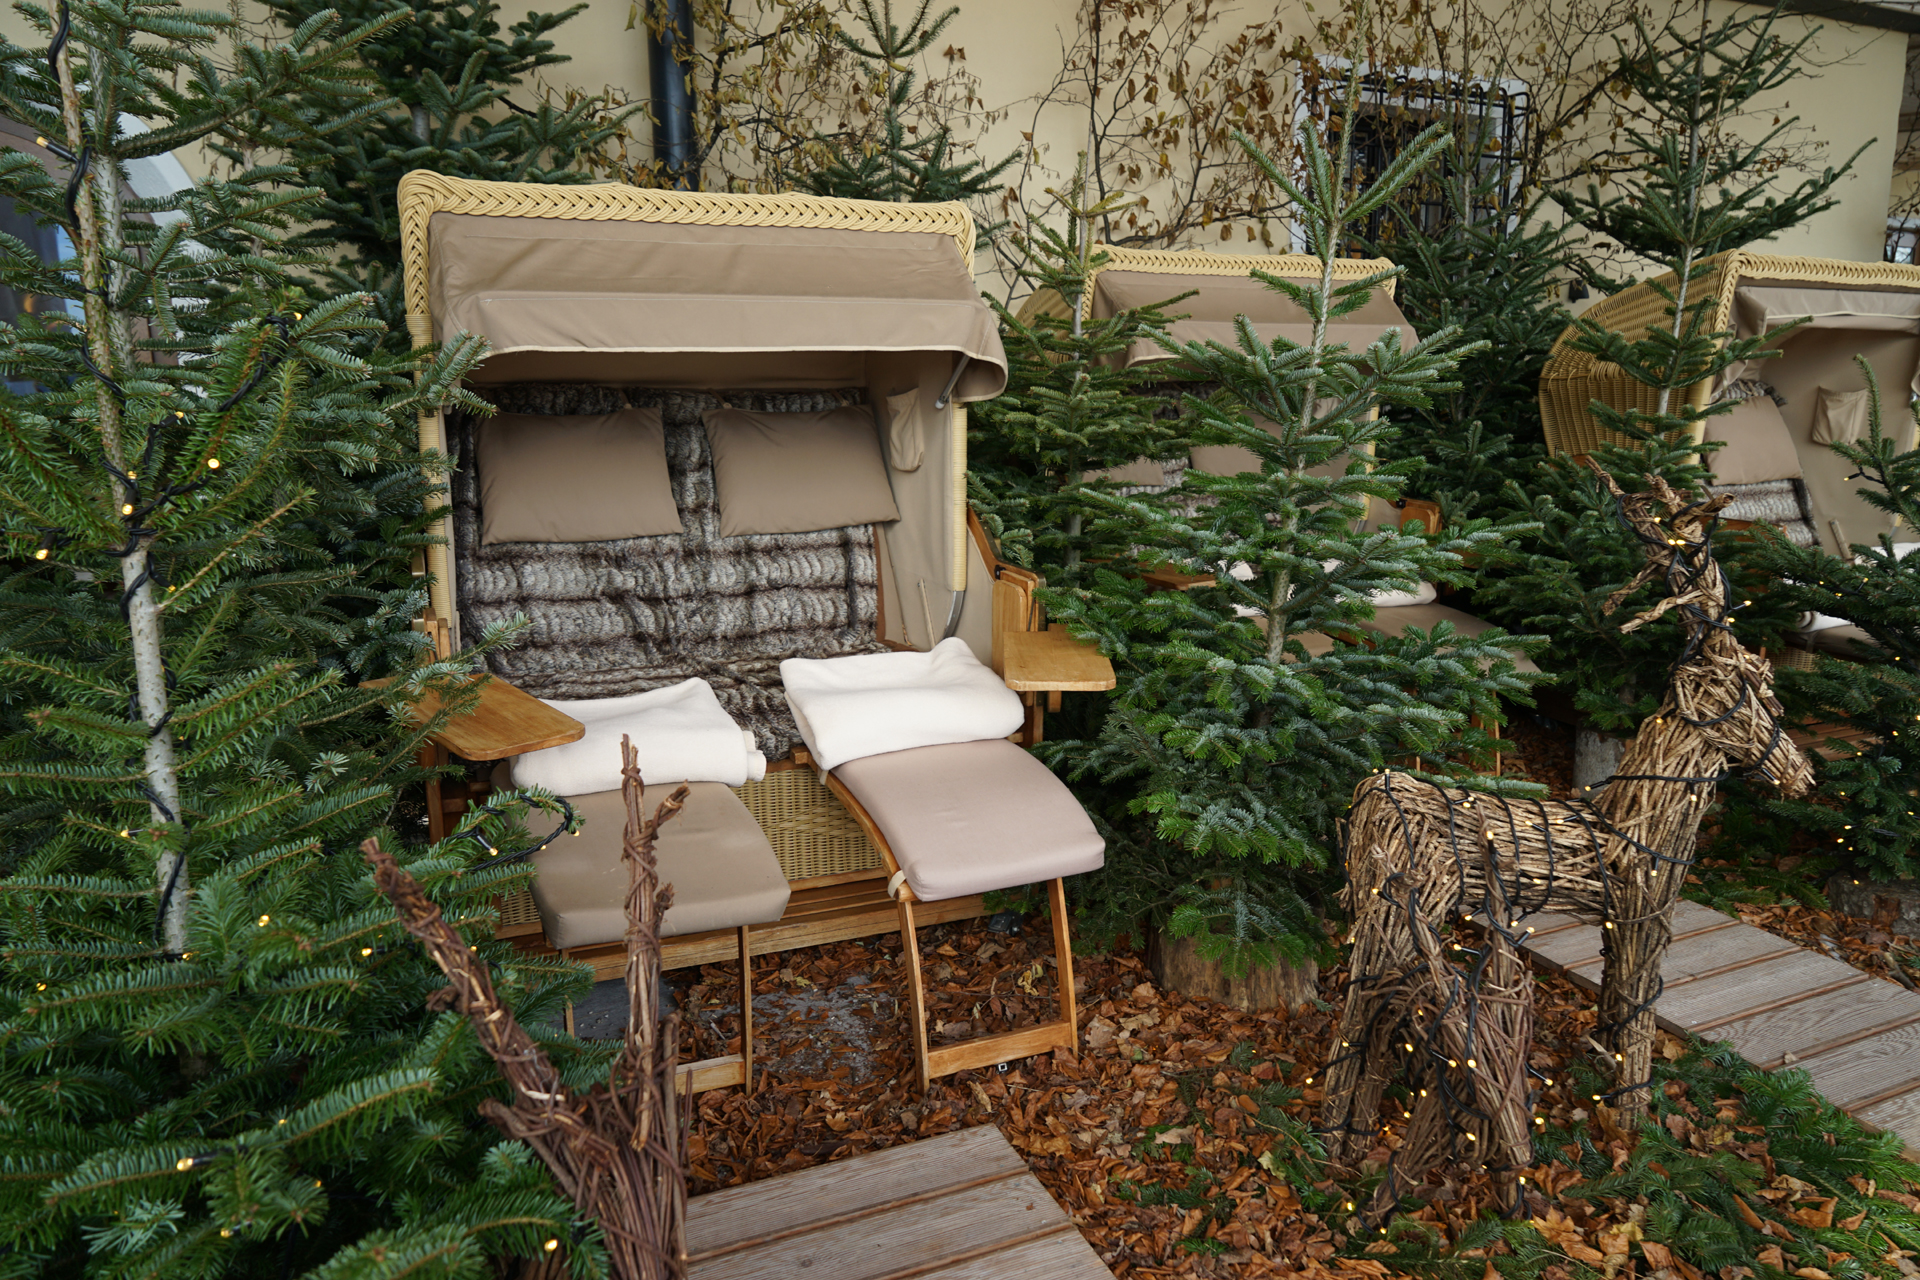 © Hammerl, Winter Louge Schlossterrasse